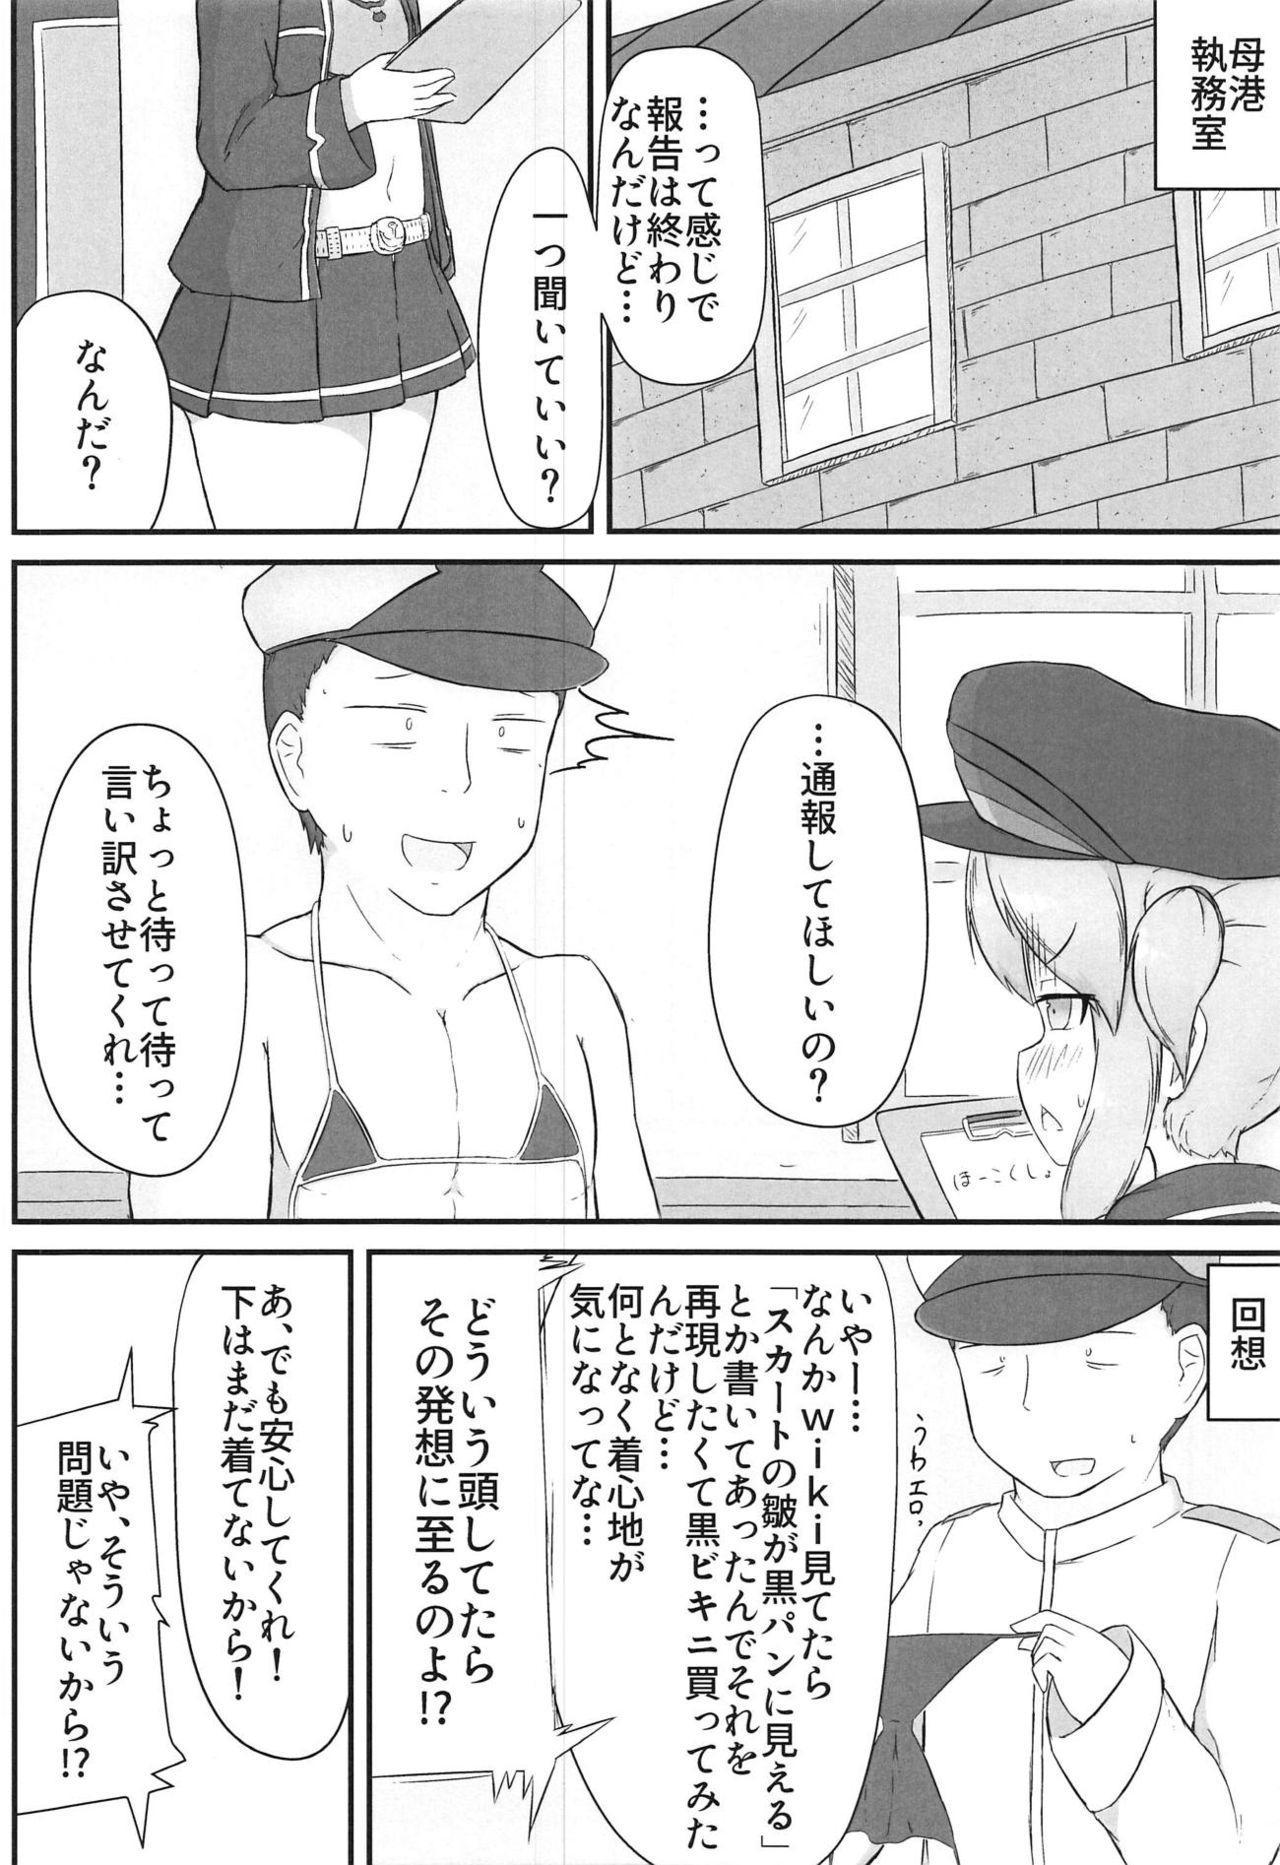 Wil-chan to Ecchi Suru Hon 4